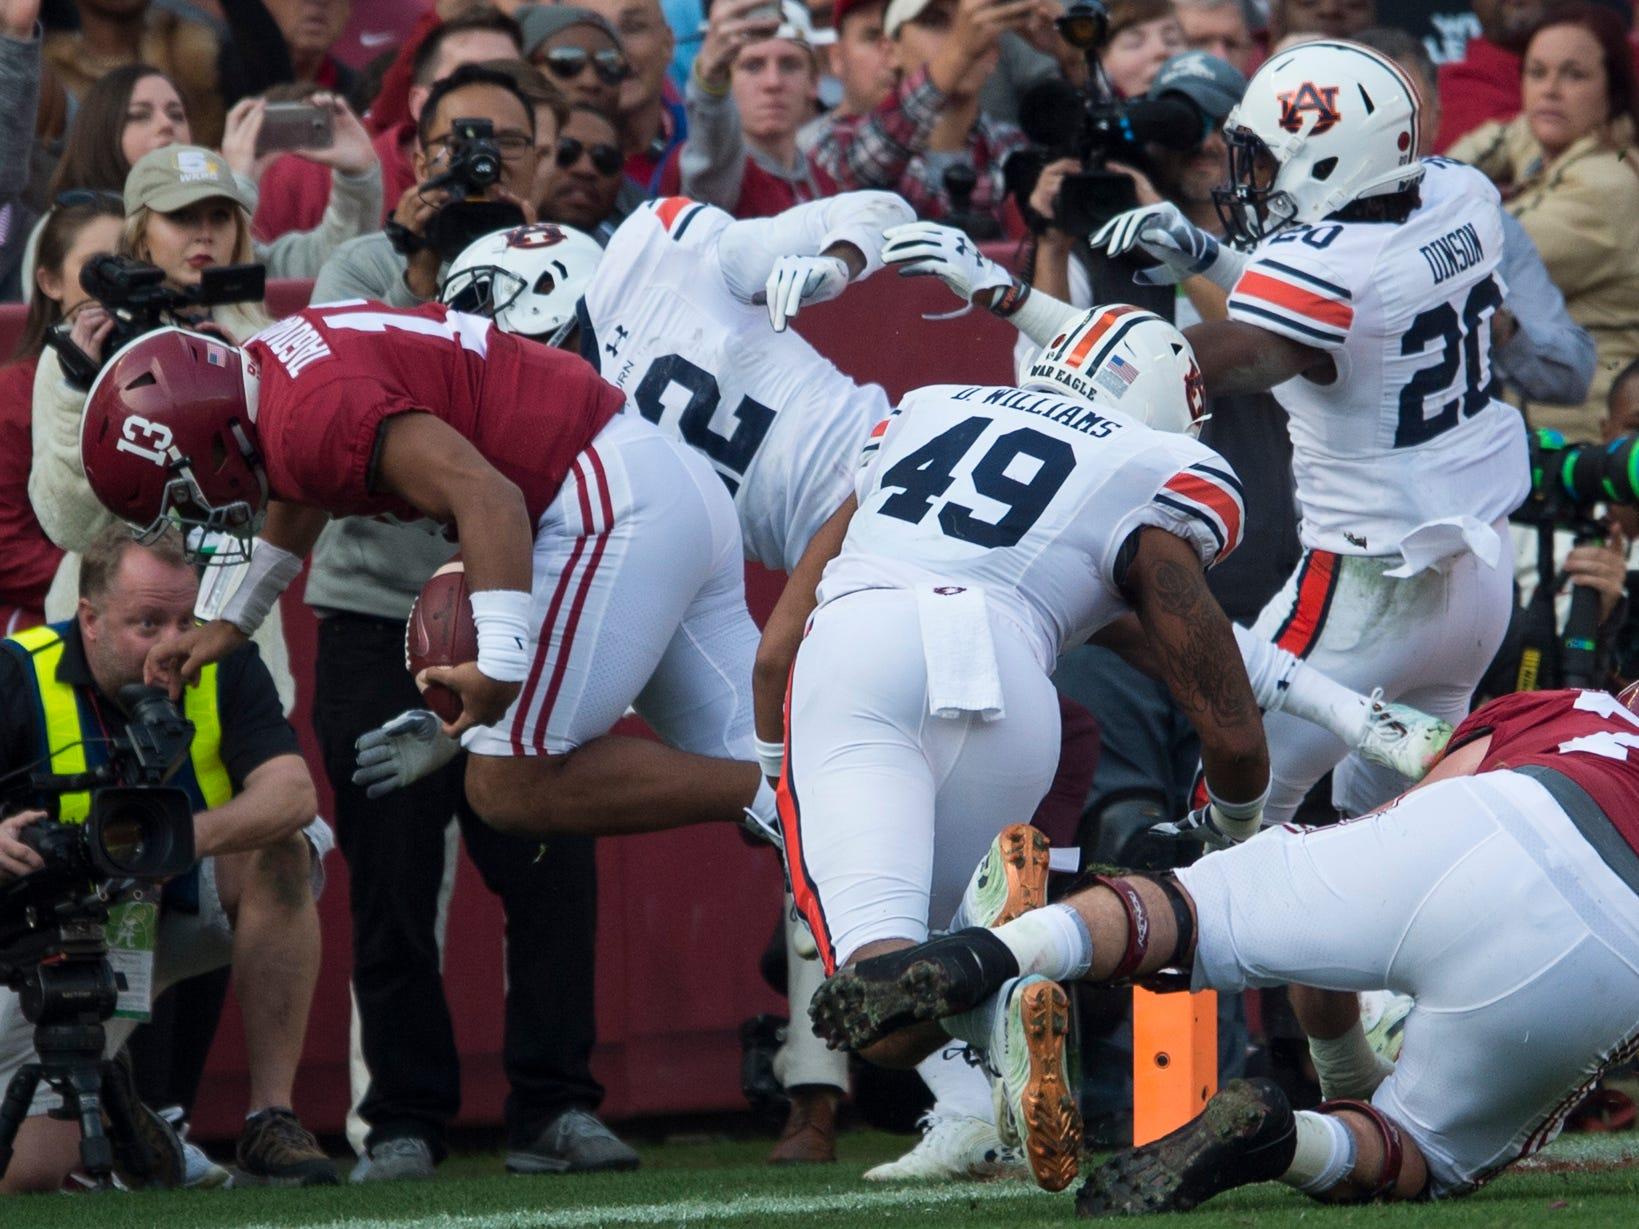 Alabama quarterback Tua Tagovailoa (13) runs into the end zone for a touchdown during the Iron Bowl at Bryant-Denny Stadium in Tuscaloosa, Ala., on Saturday, Nov. 24, 2018. Alabama leads Auburn 17-14 at halftime.